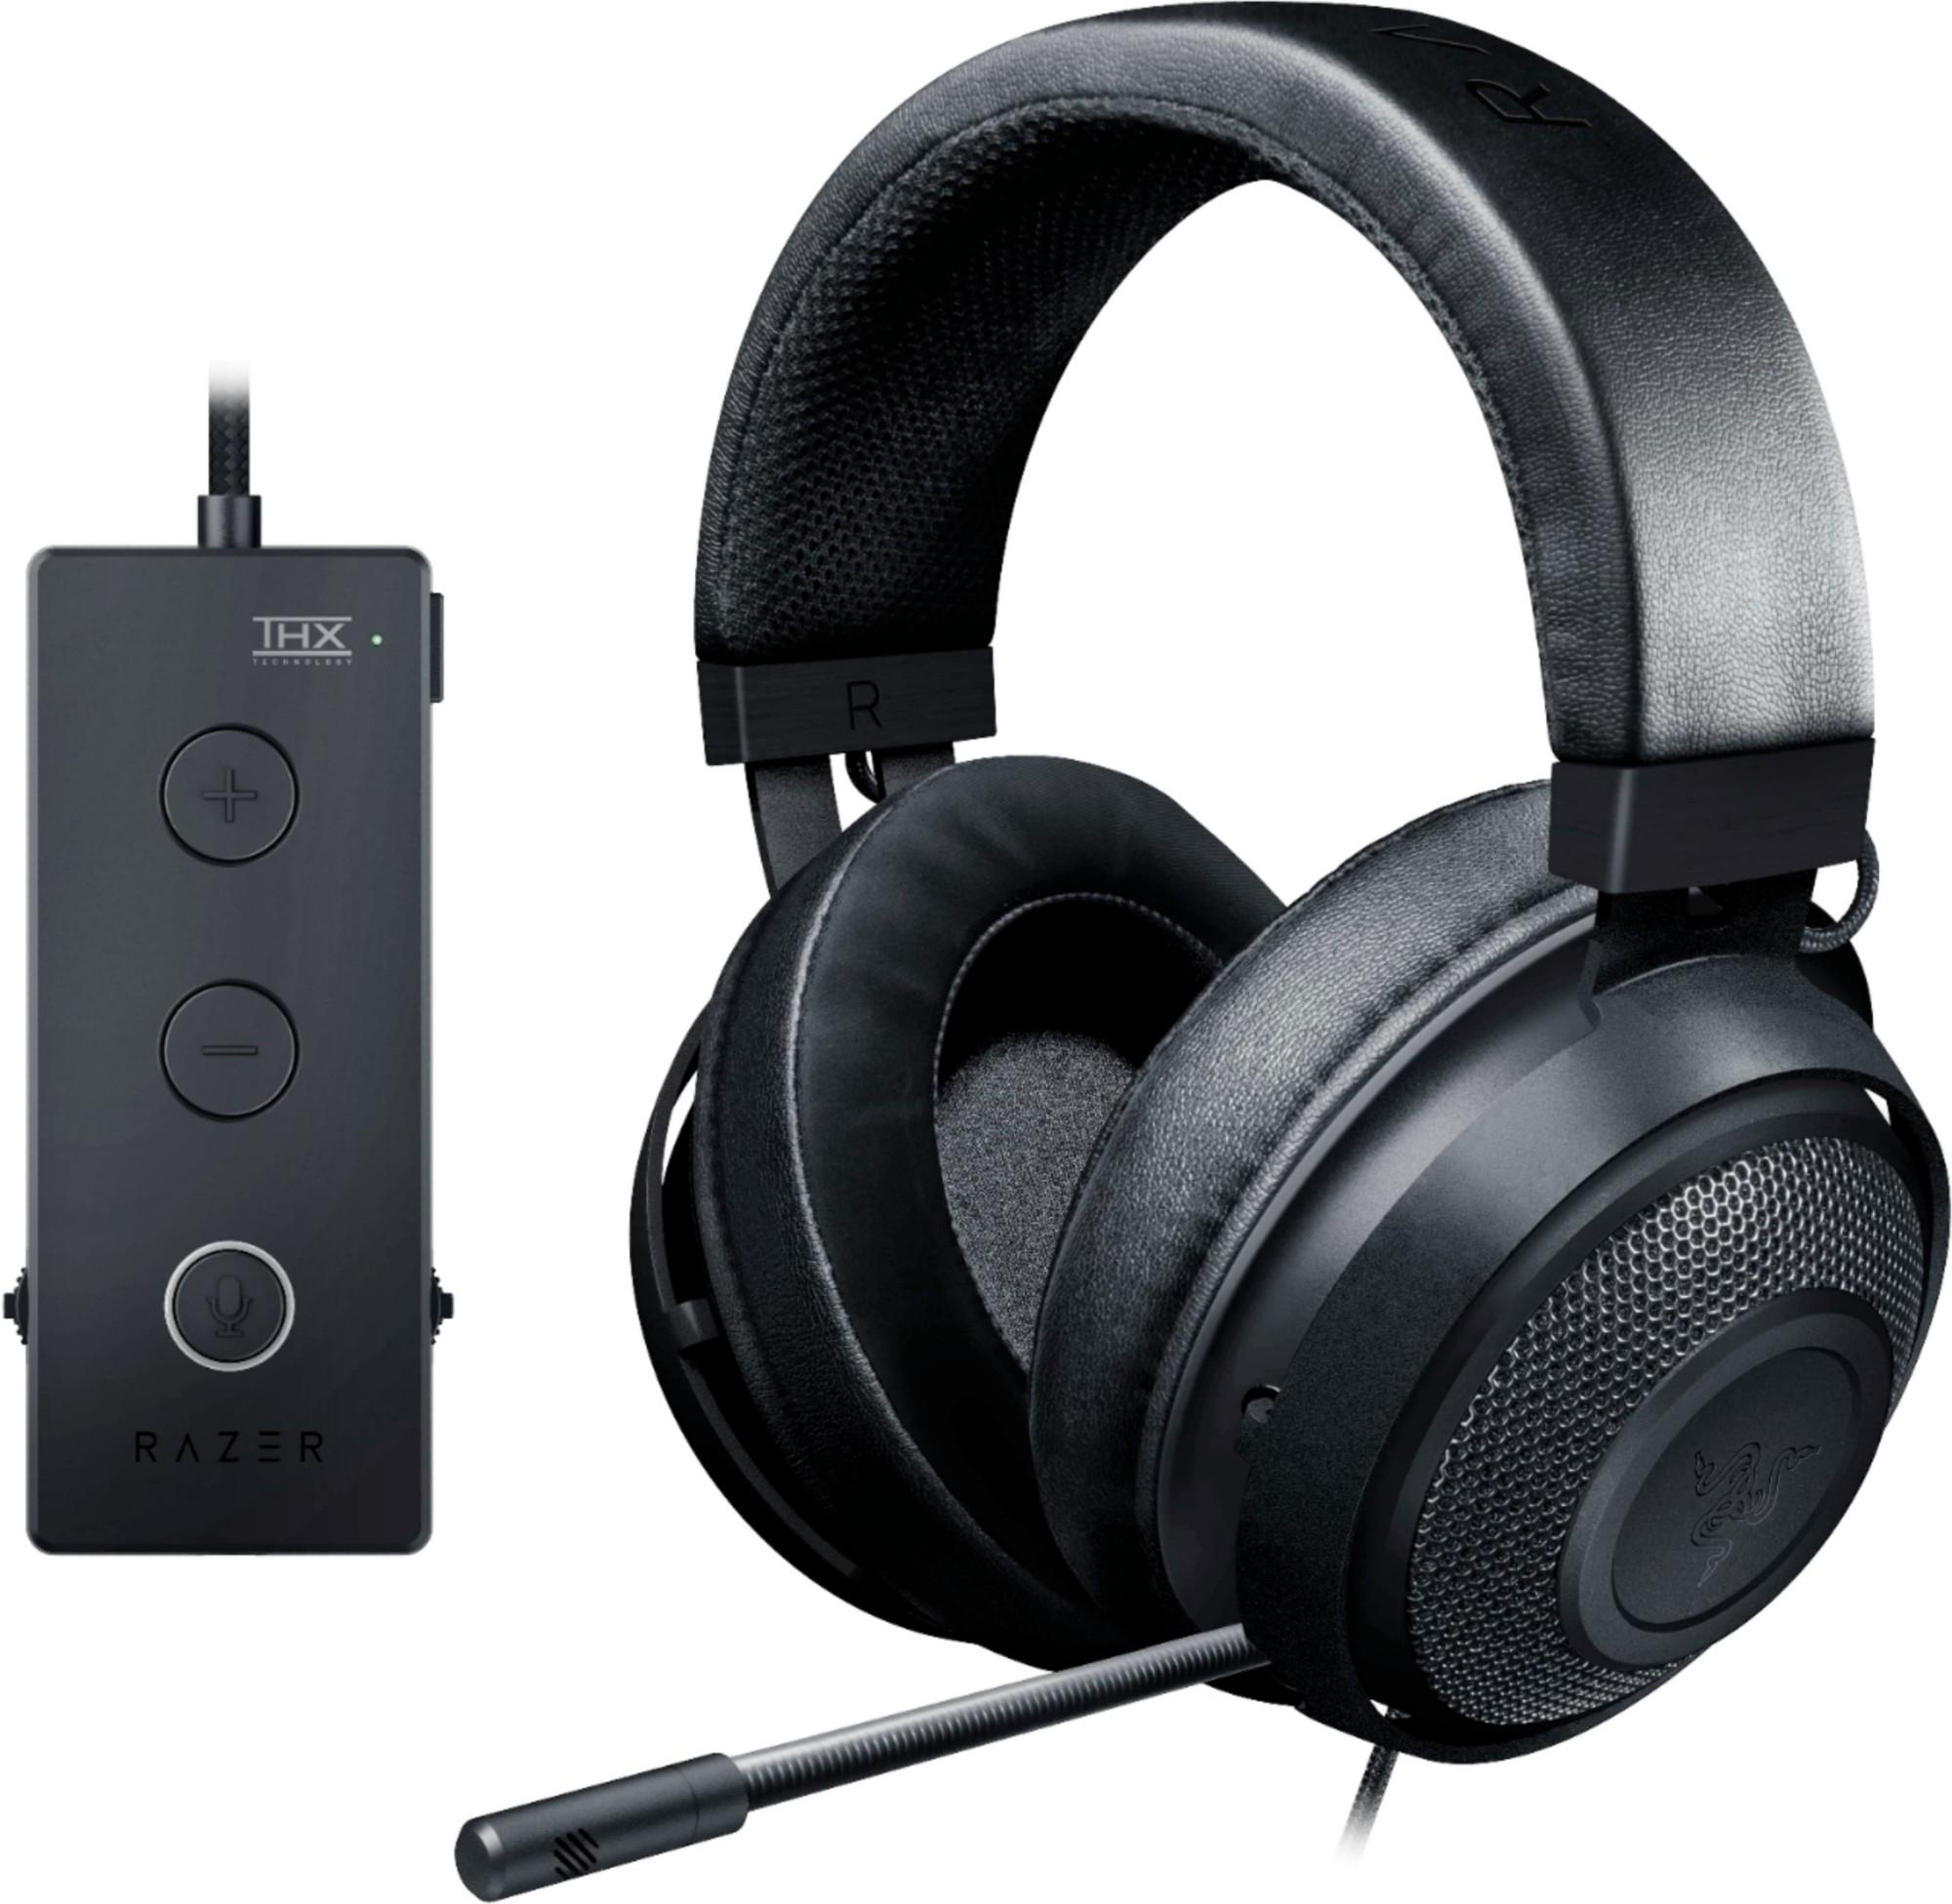 Kraken Tournament Edition Headset Black